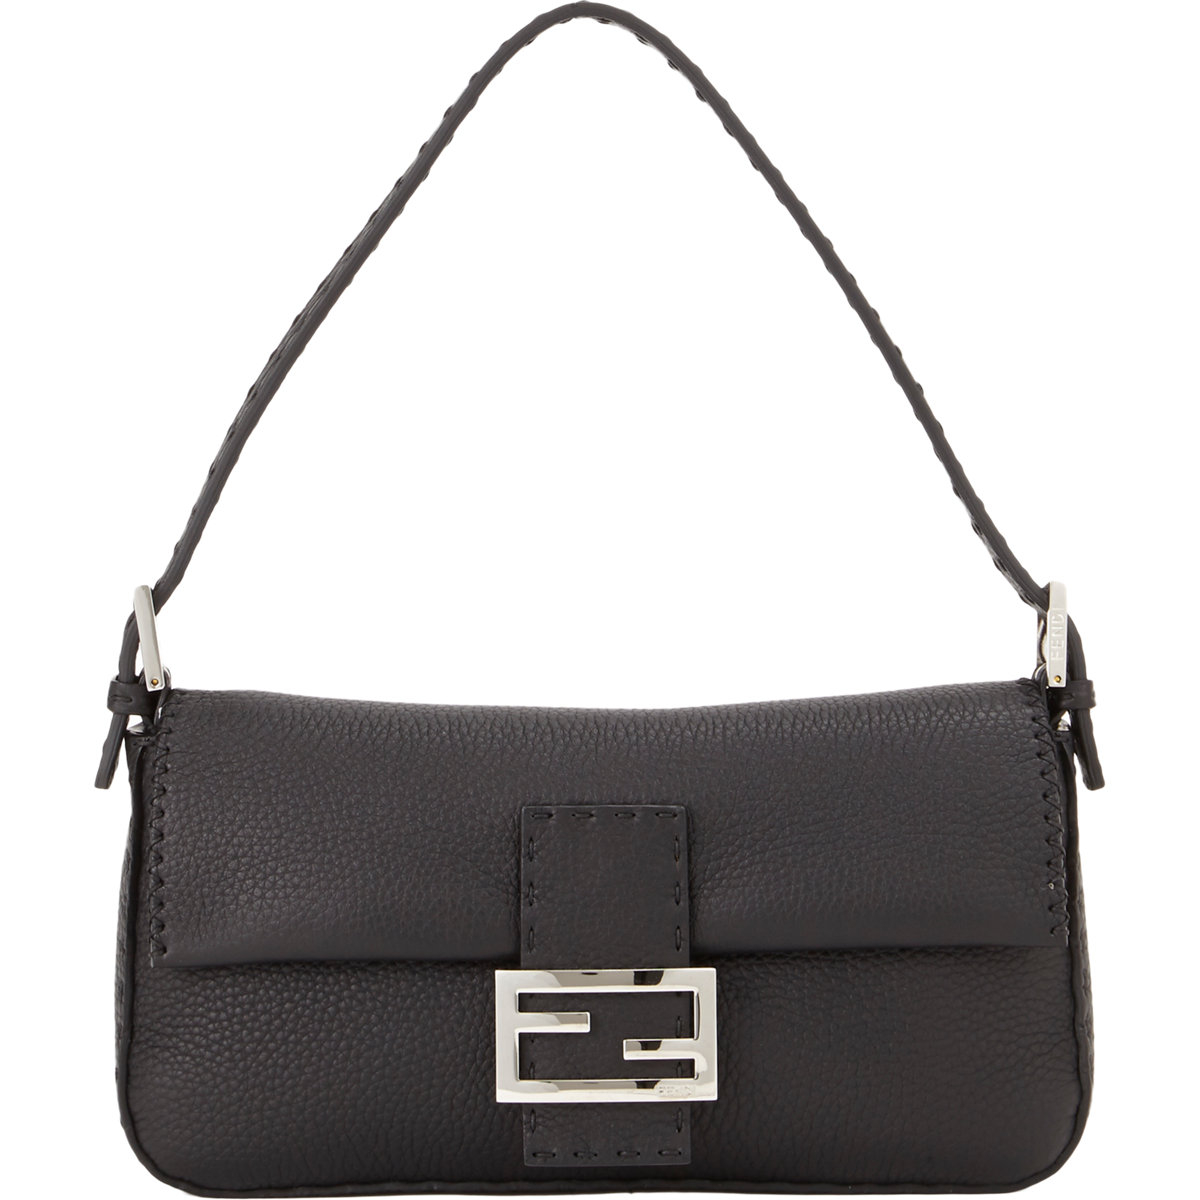 Lyst - Fendi Selleria Baguette Bag in Black 66df4462b9f64